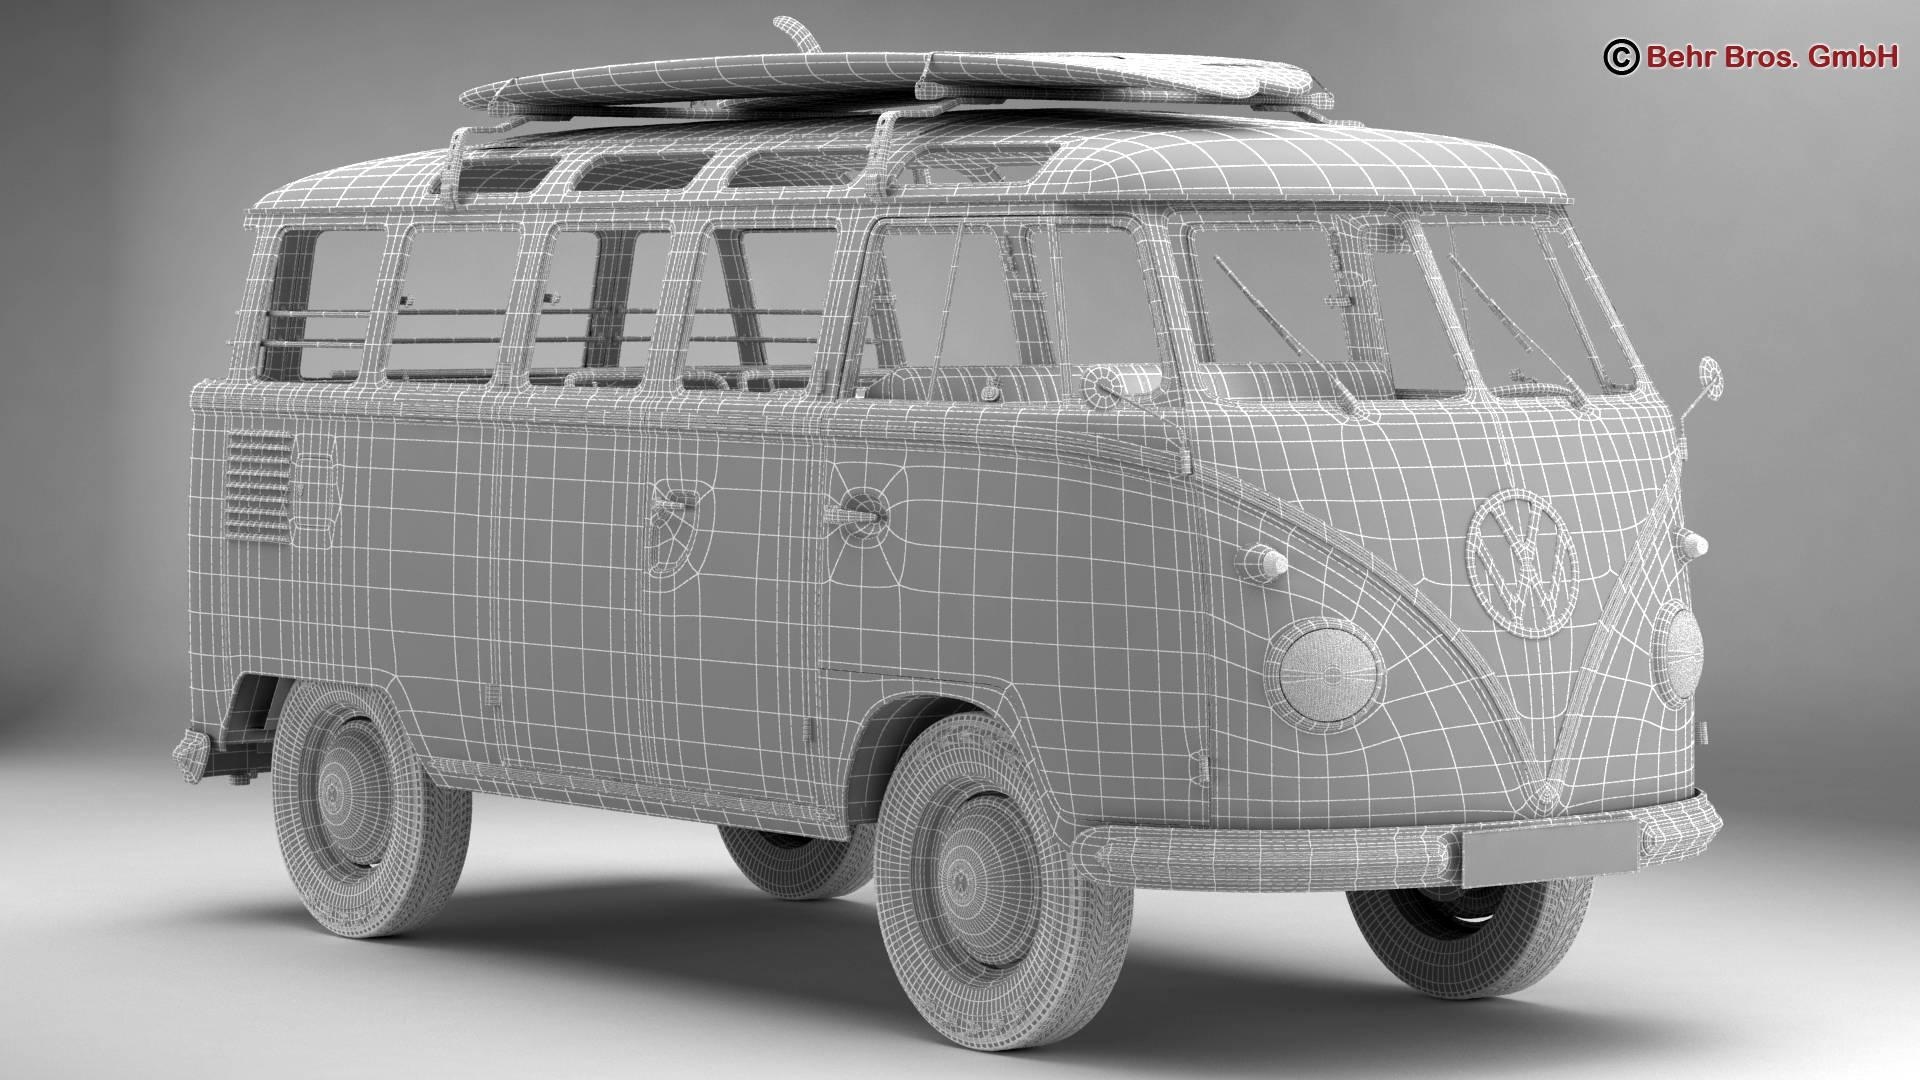 volkswagen t1 samba 1959 accessories 3d model. Black Bedroom Furniture Sets. Home Design Ideas